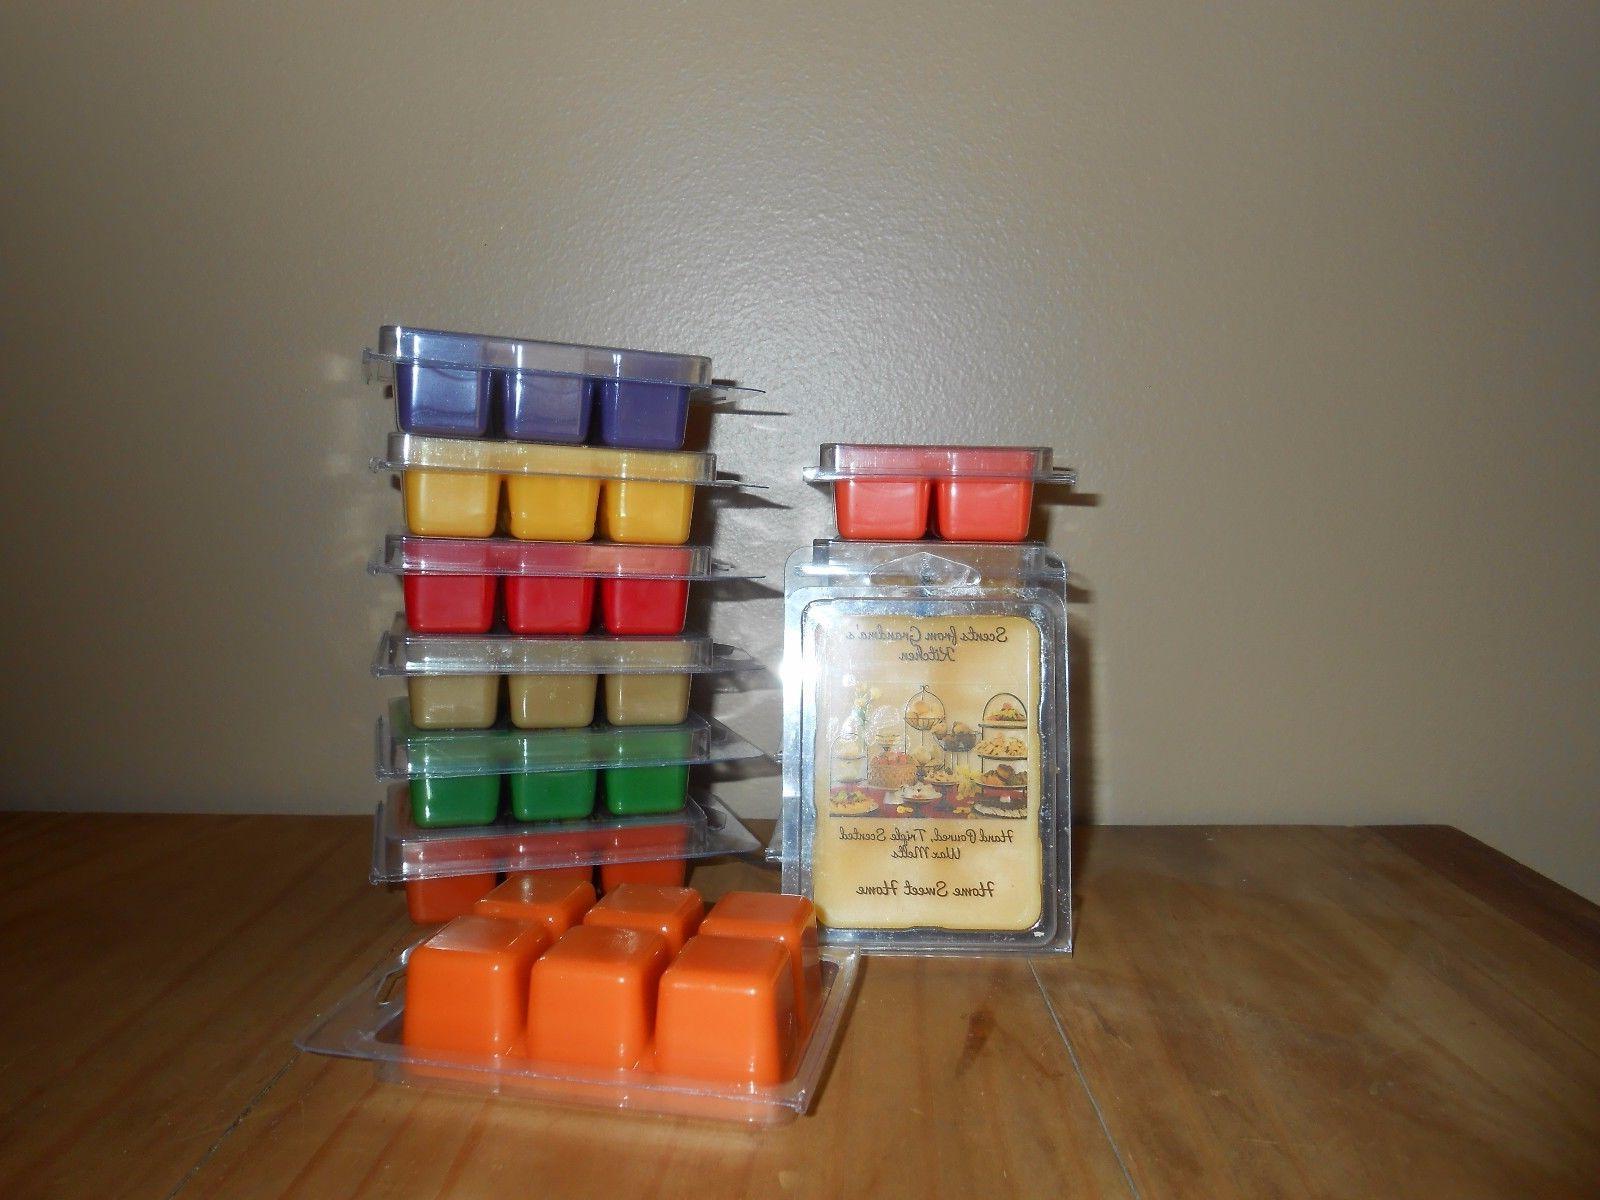 Scents Grandma's *HEAVILY SCENTED* Wax Tart Melts 6 cube